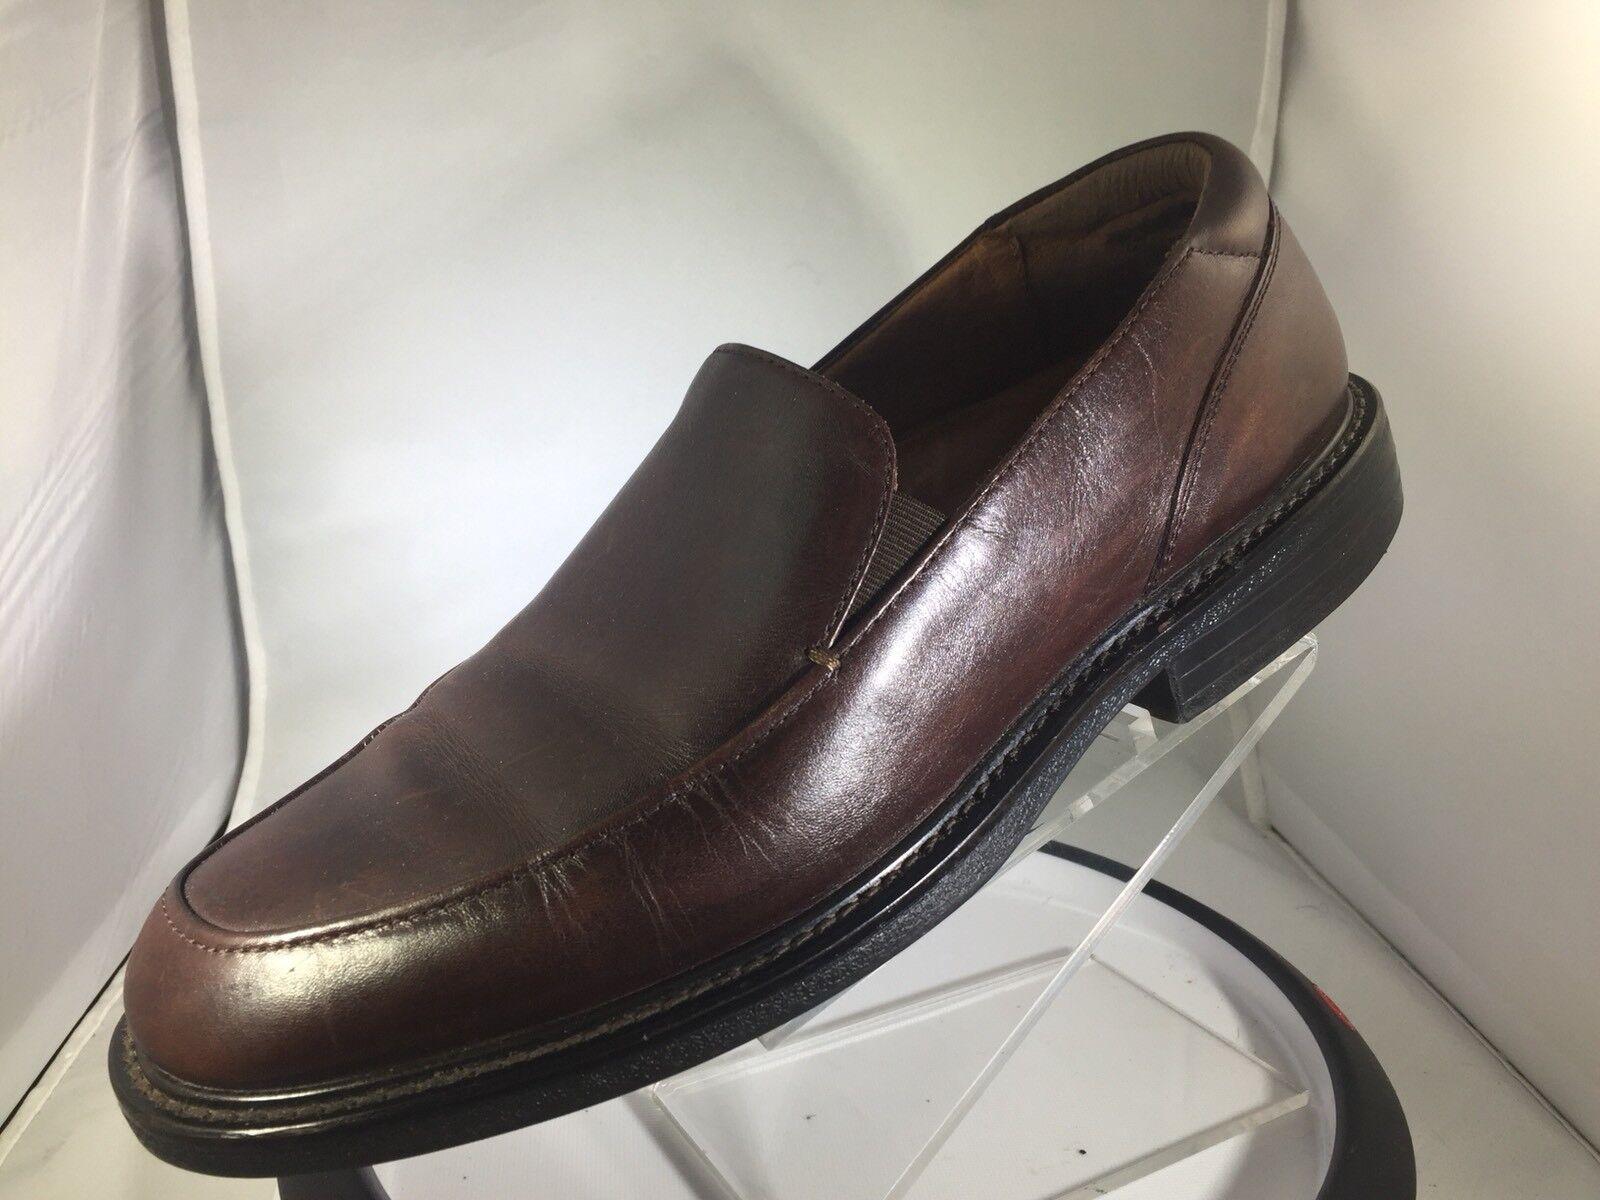 Florsheim Brown Toe Leather Slip On Apron Toe Brown Dress Loafers Men's Size 10 M 8d8c9c